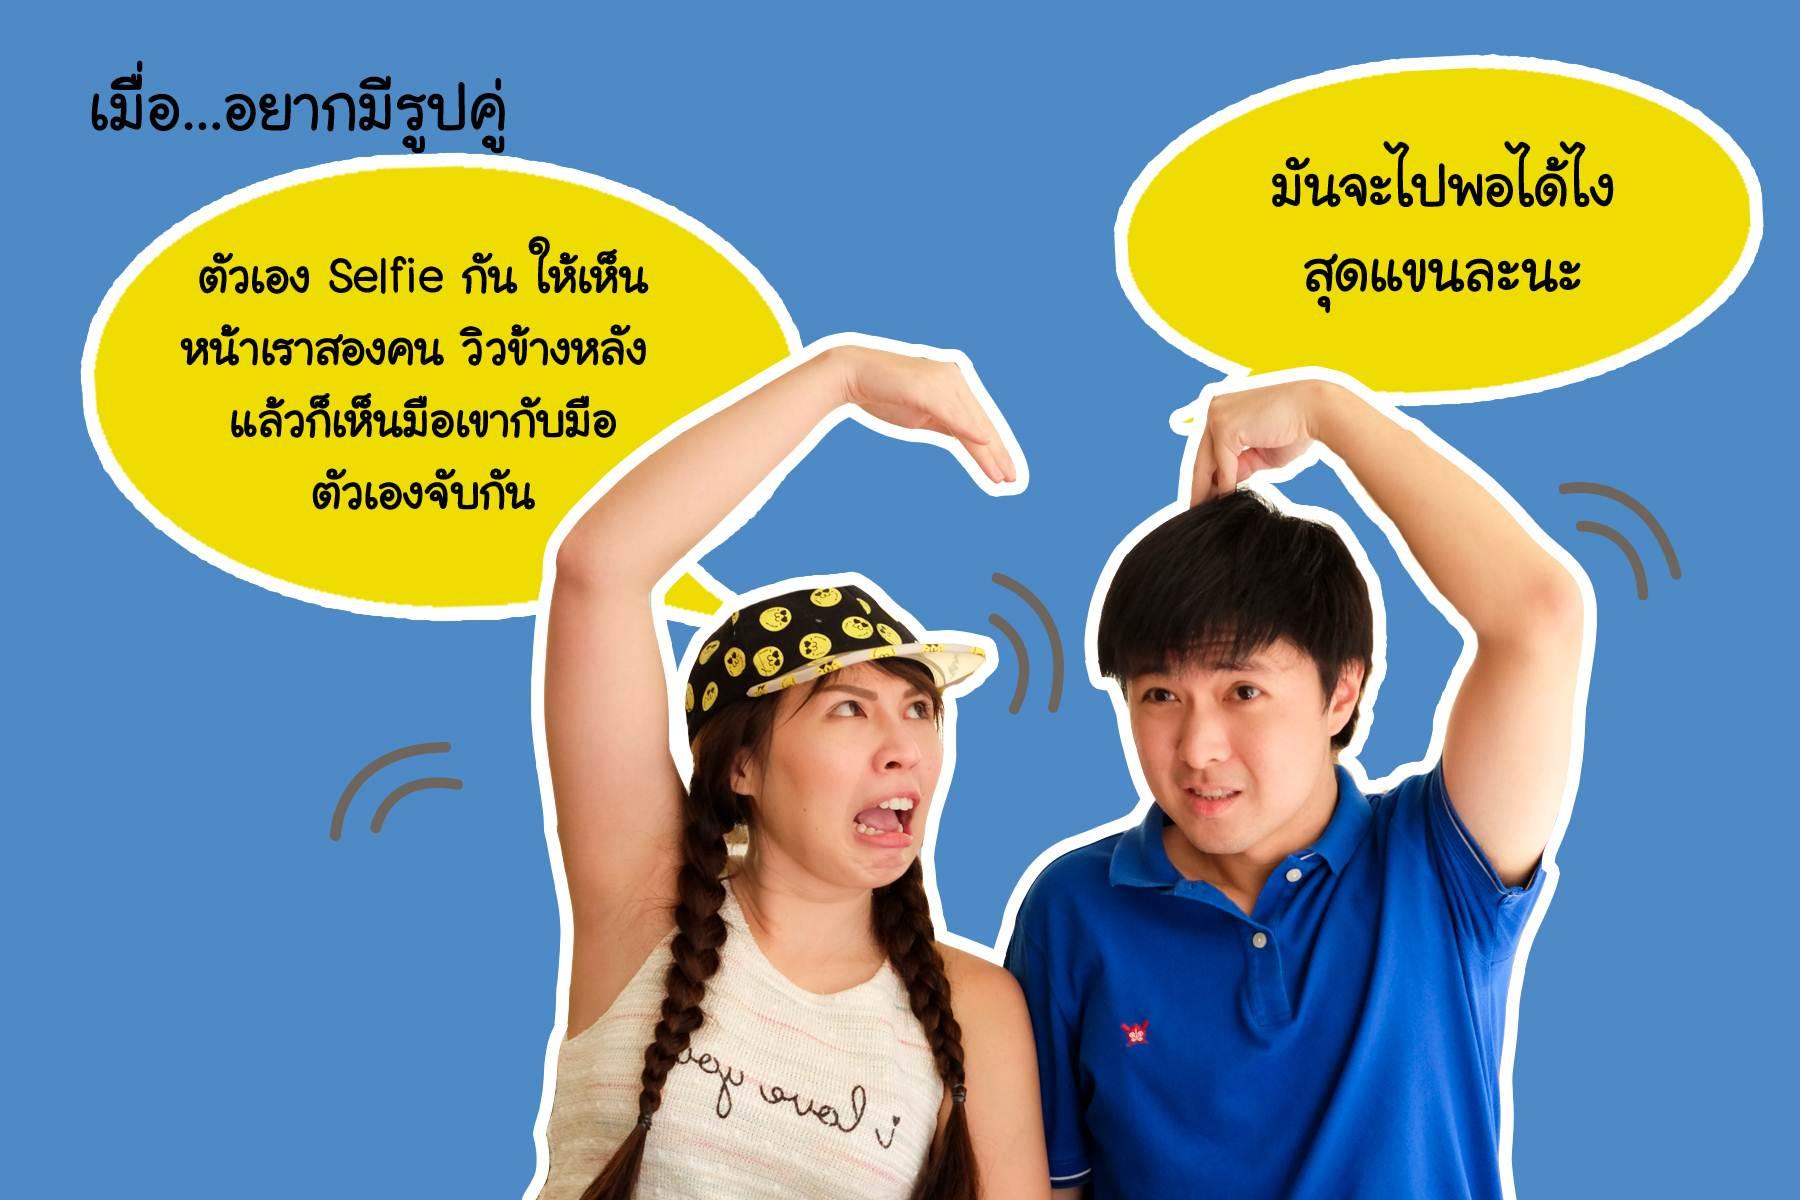 9. Palm selfie